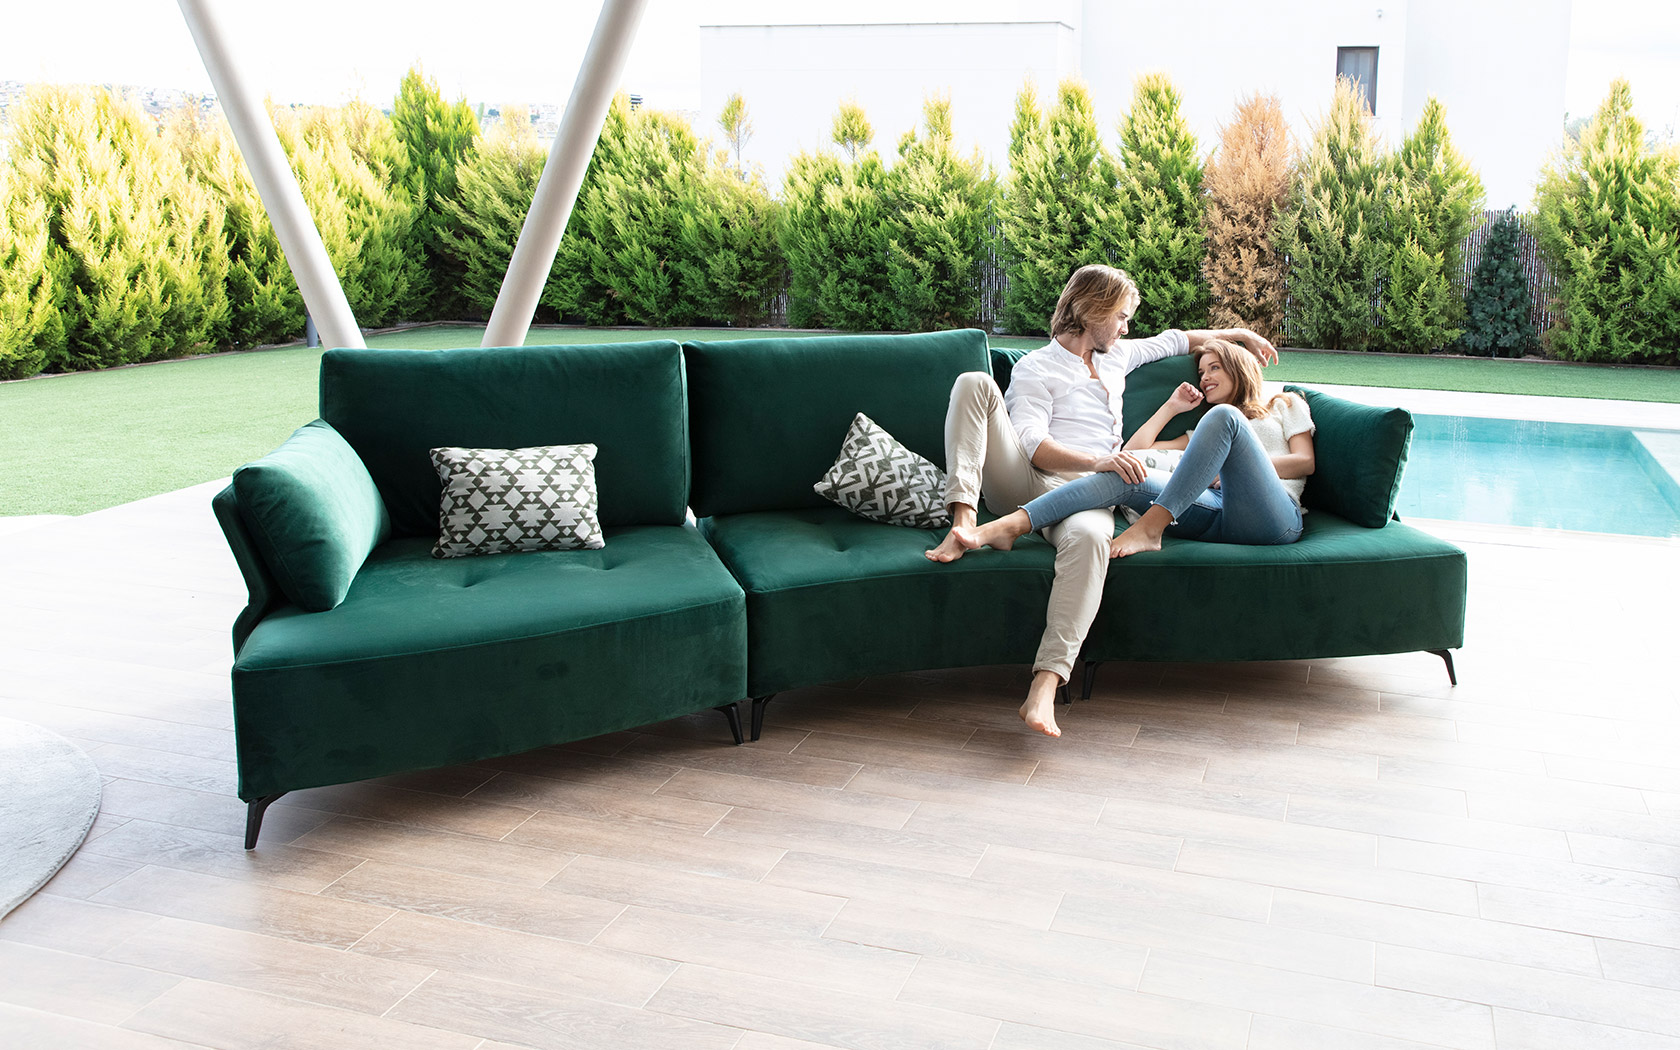 kalahari sofa 2021 04